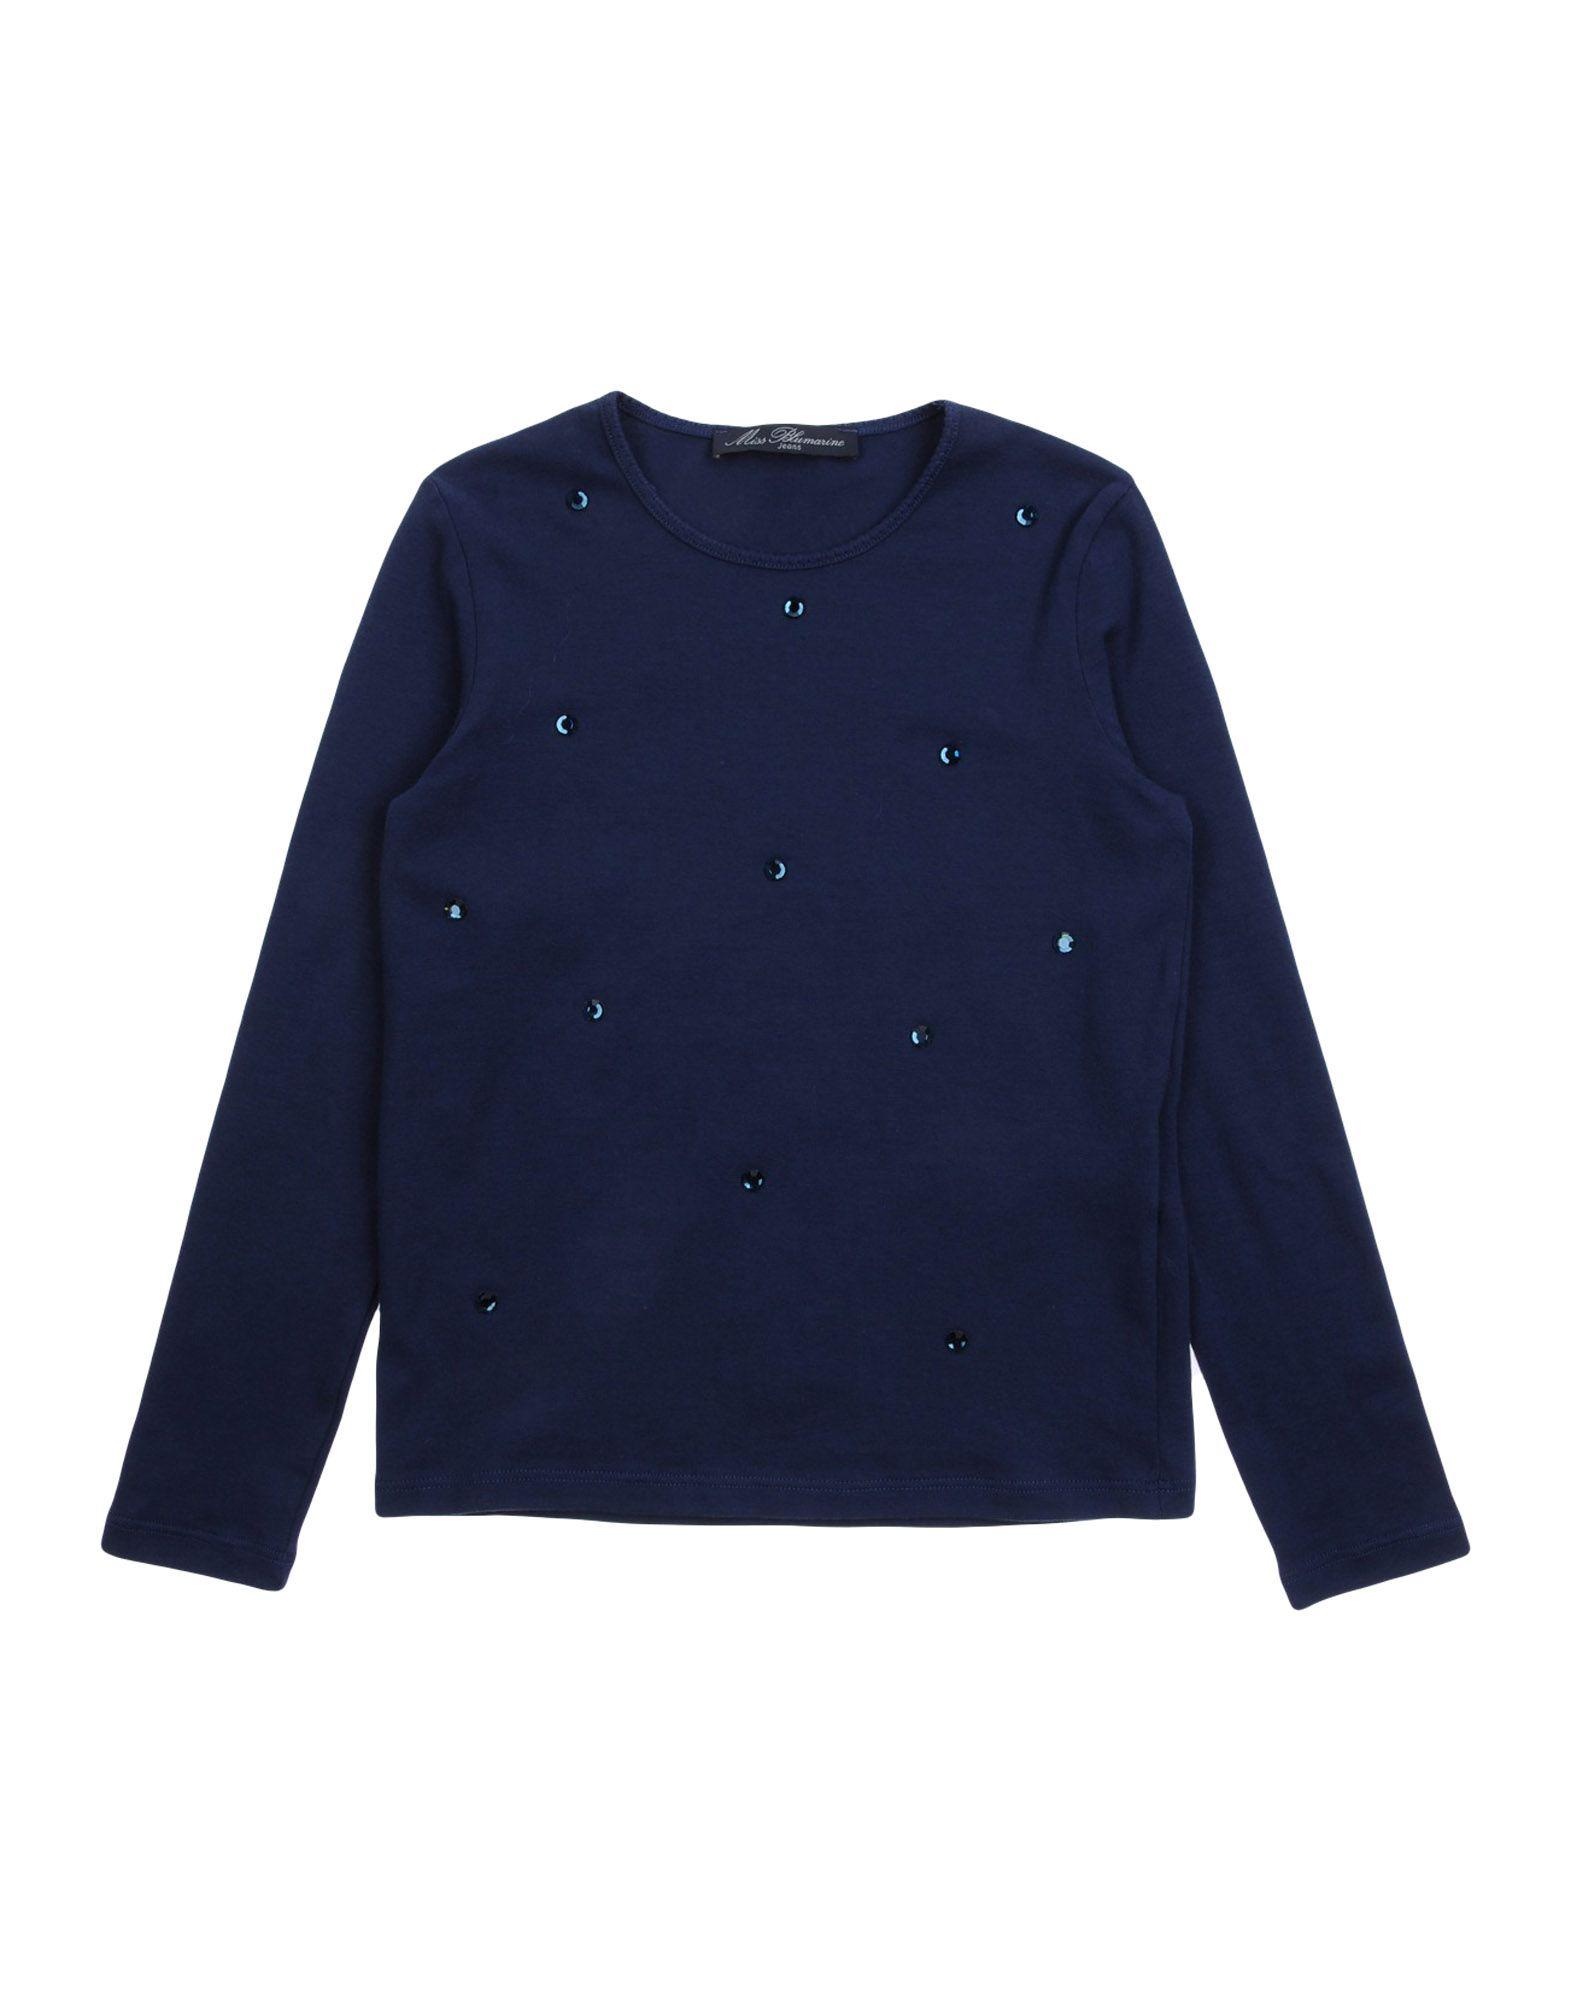 MISS BLUMARINE JEANS Футболка blumarine jeans футболка